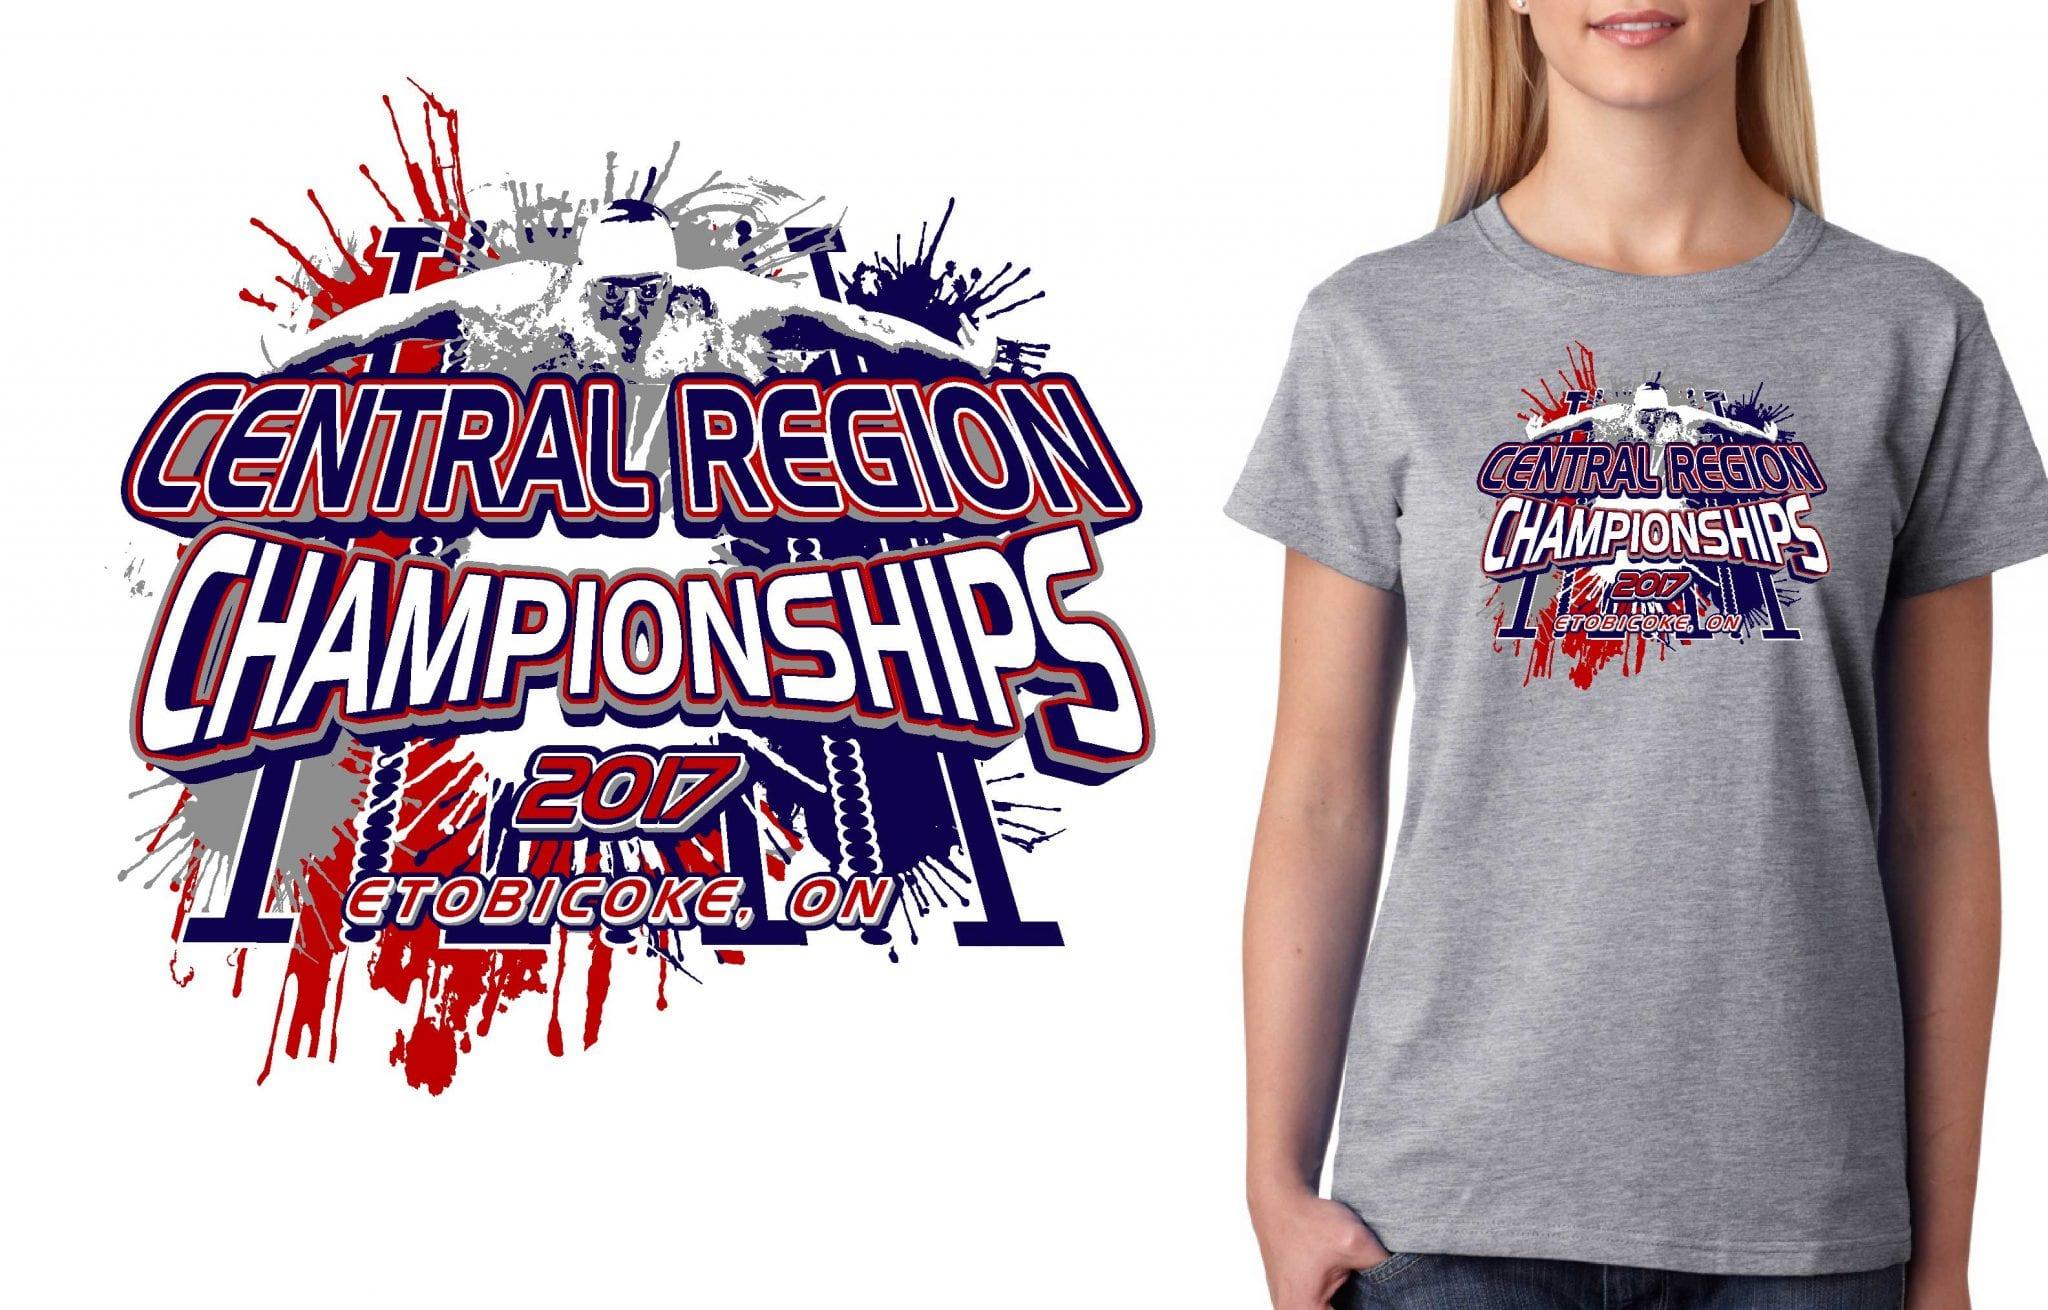 2017 Central Region B Championships vector logo design for swimming t-shirt UrArtStudio